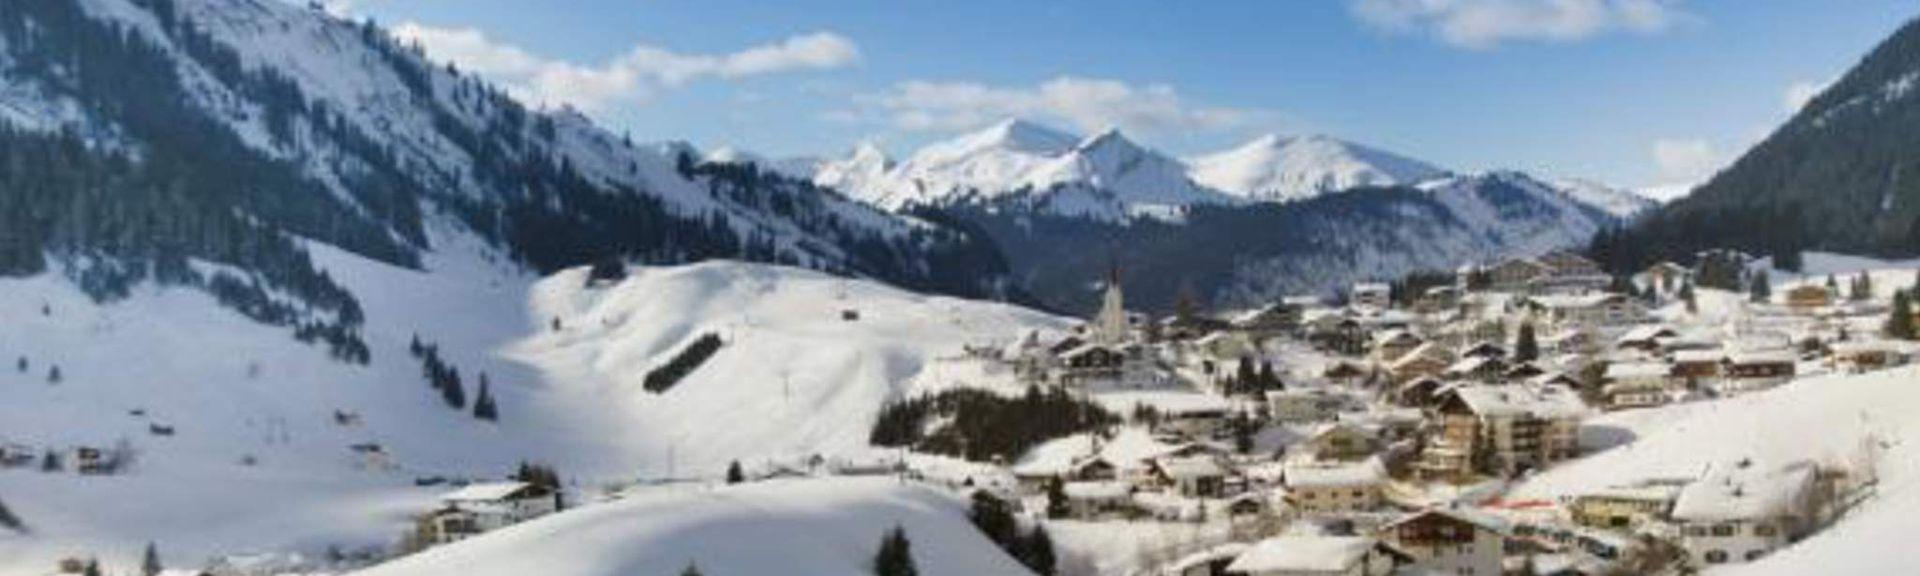 Waengle, Tyrol, Austria